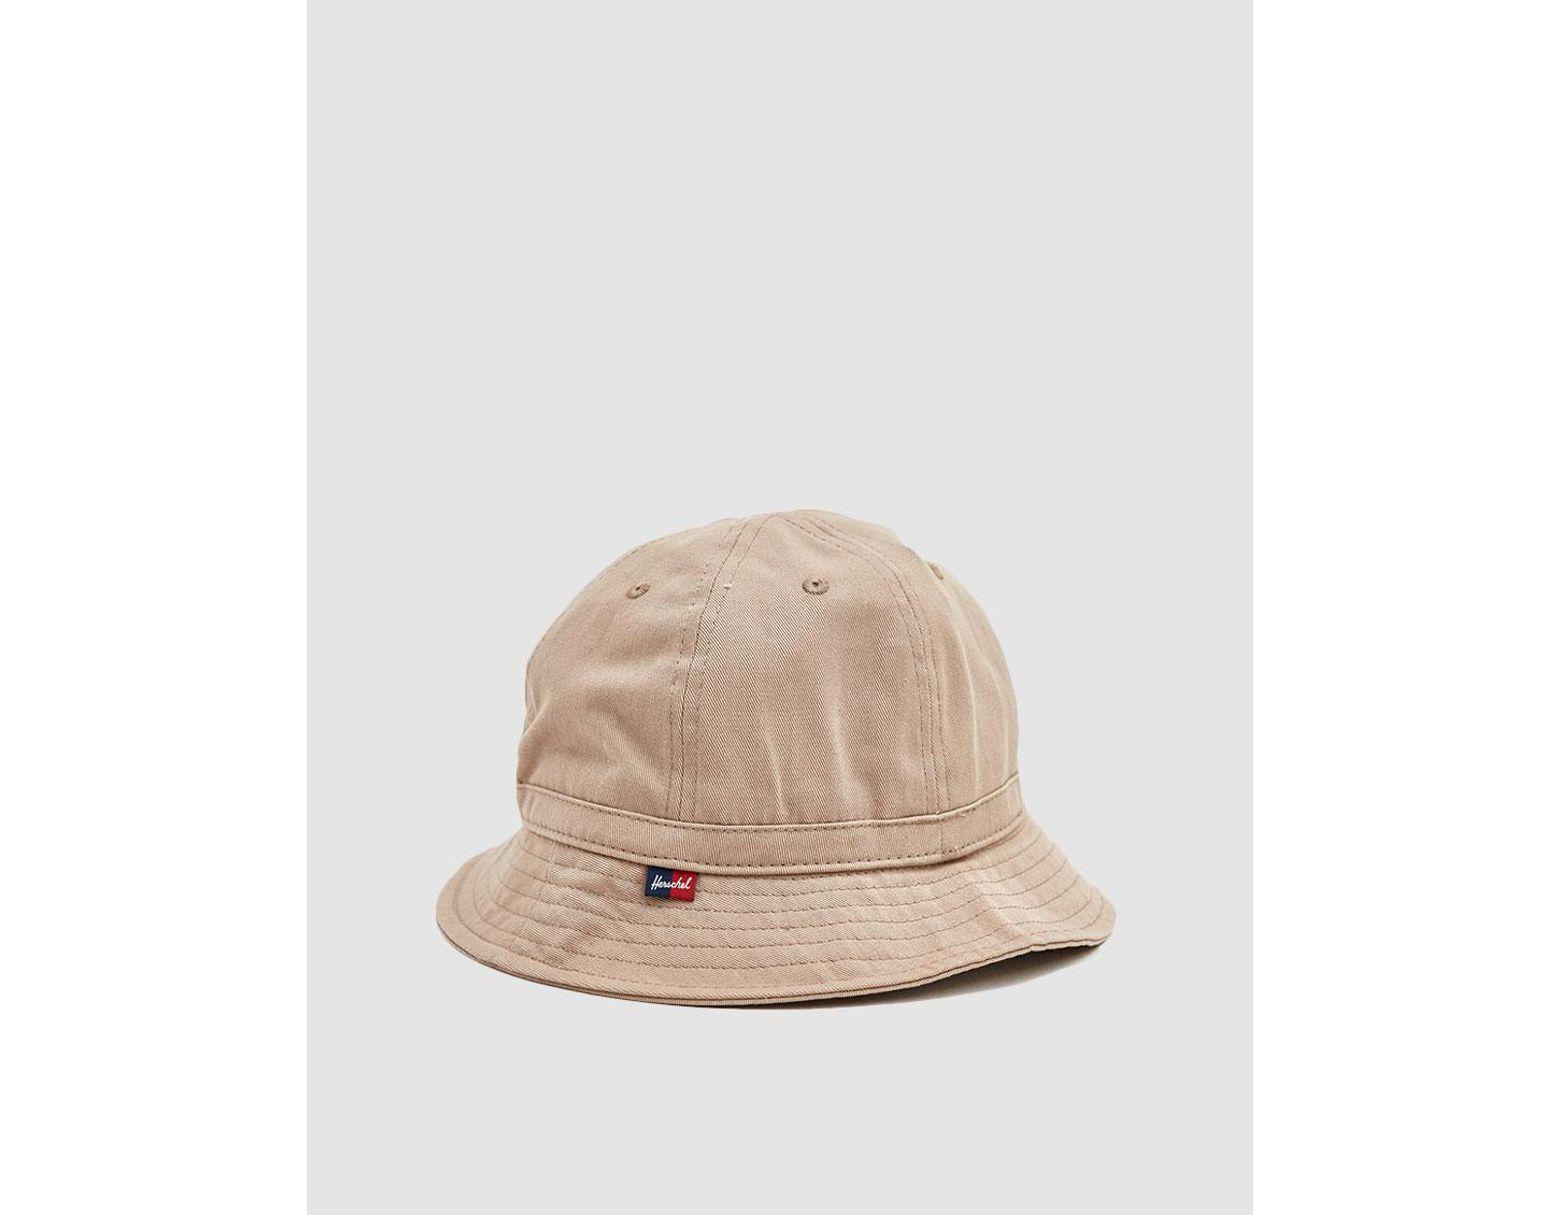 378e0f873613 Herschel Supply Co. Cooperman Bucket Hat in Natural - Lyst